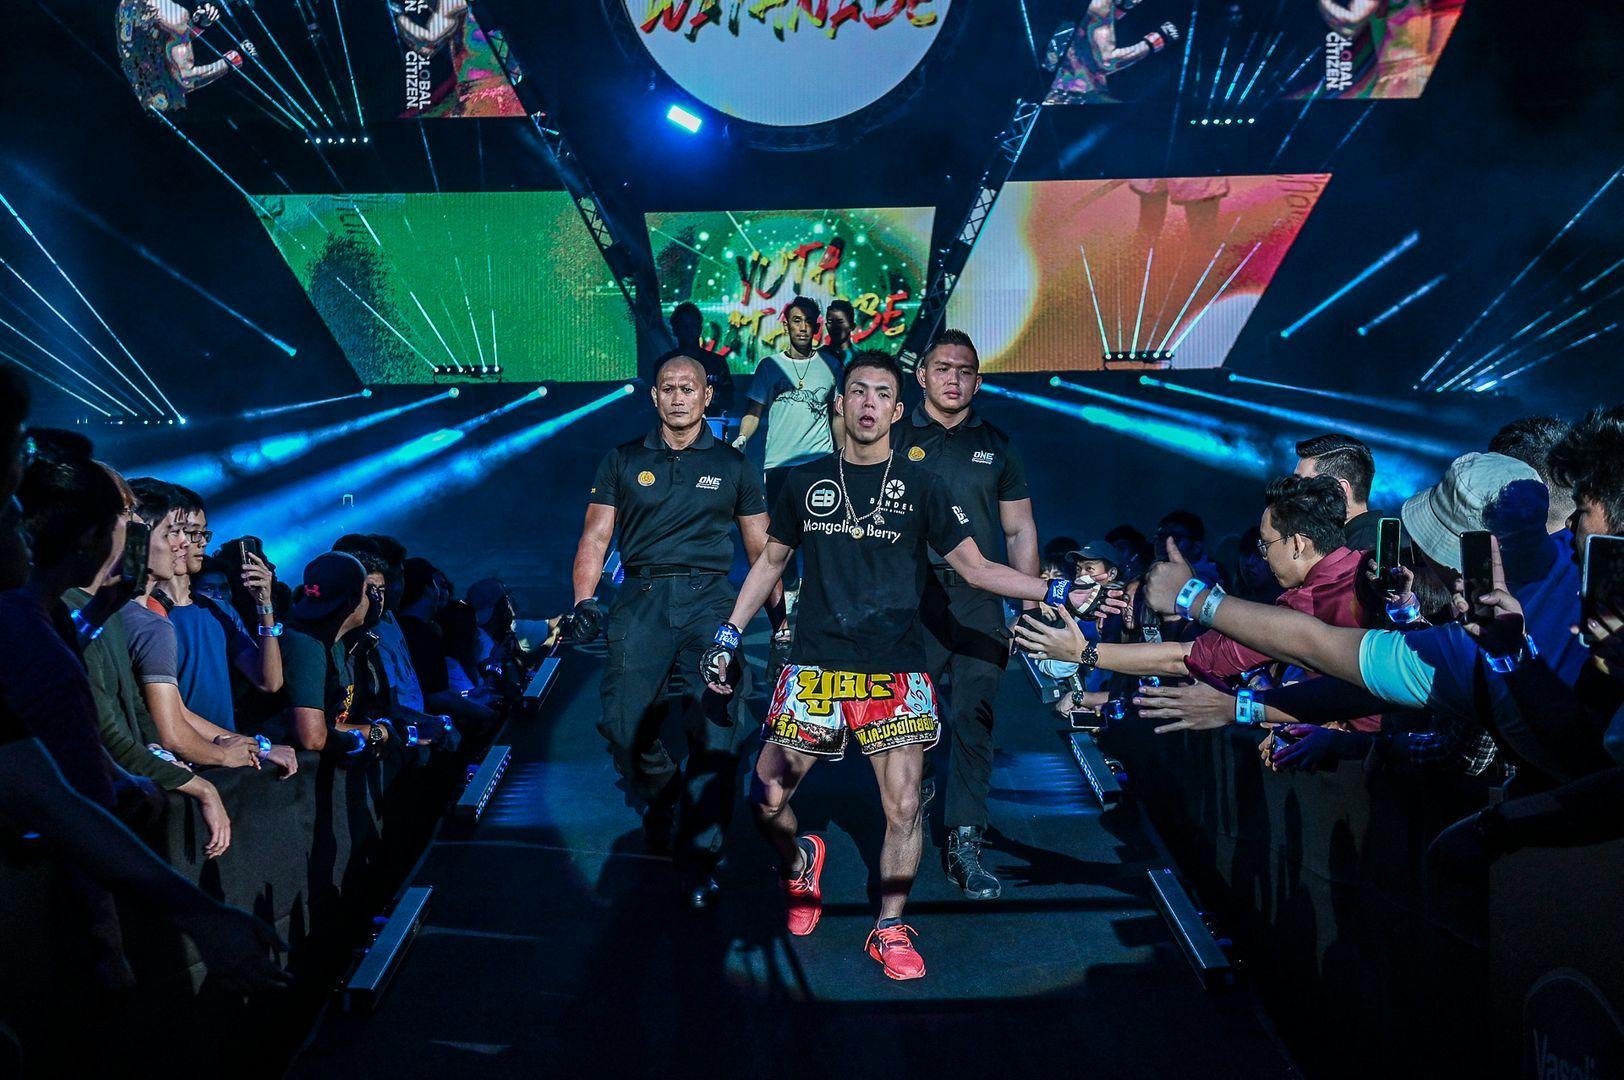 Japanese Muay Thai Fighter Yuta Watanabe enters the arena